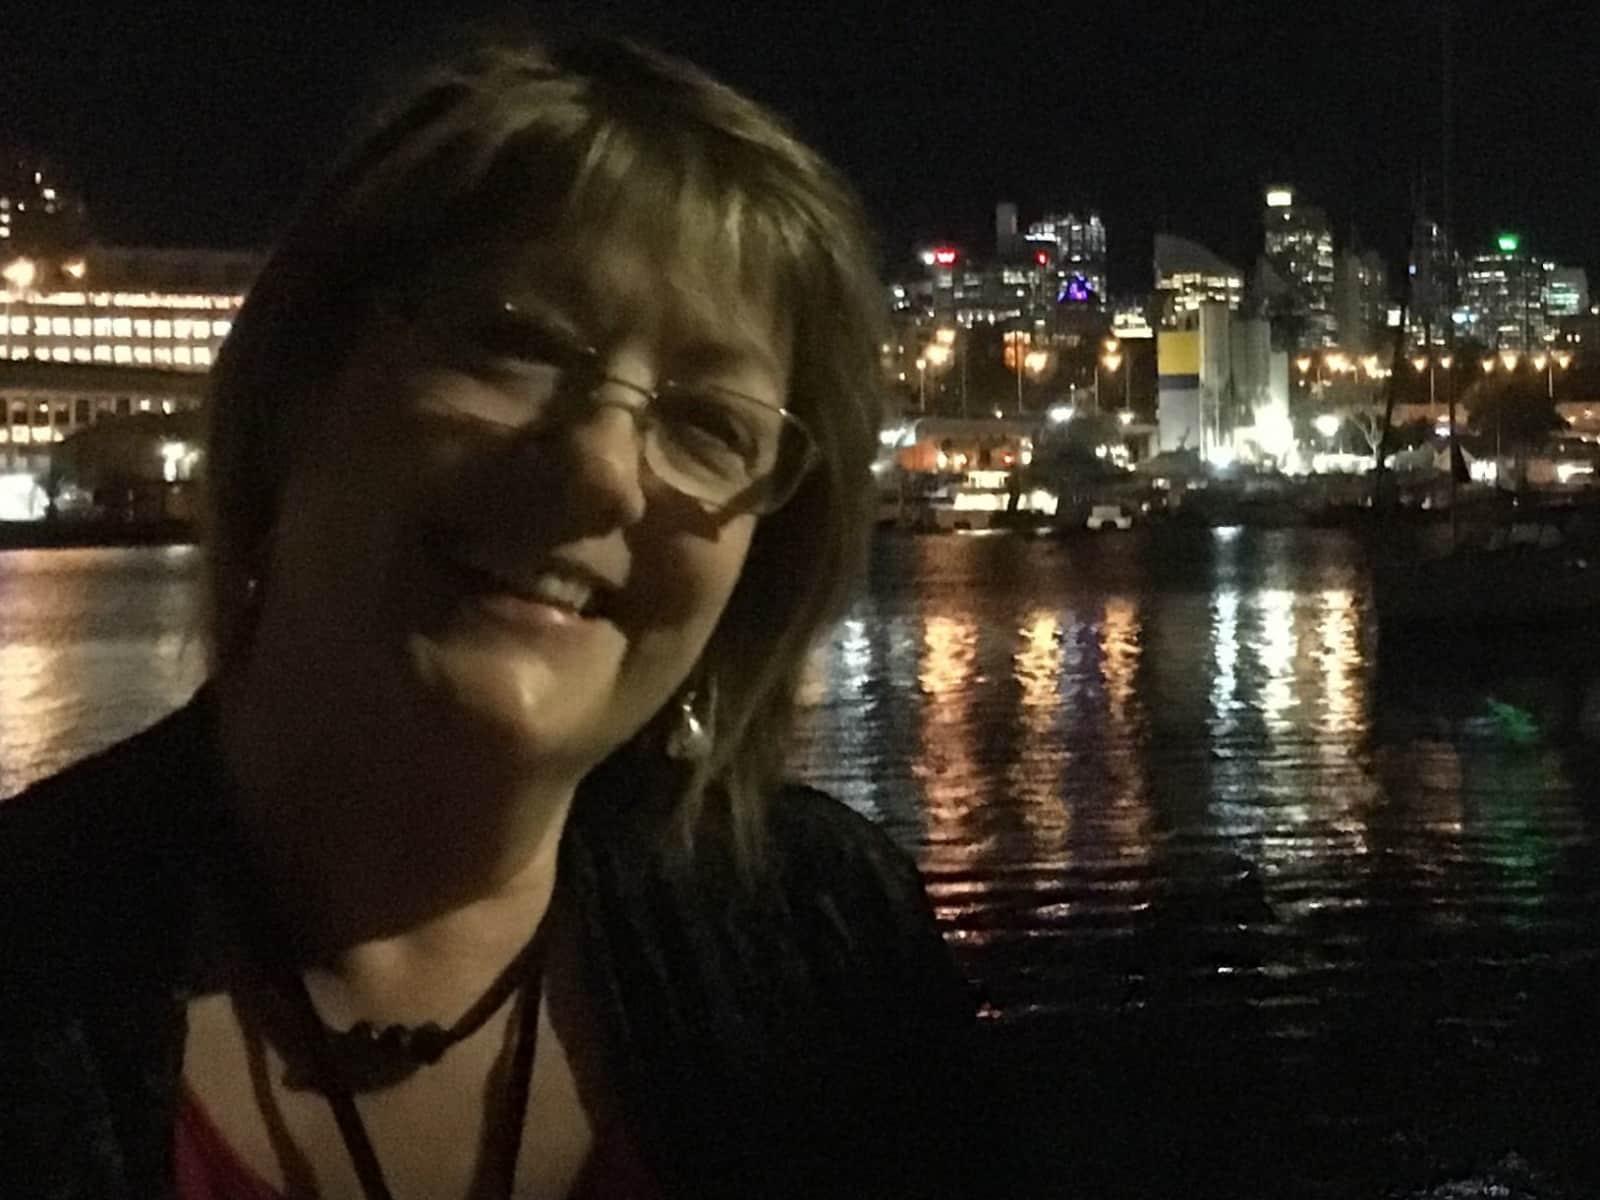 Lorraine from Wagga Wagga, New South Wales, Australia